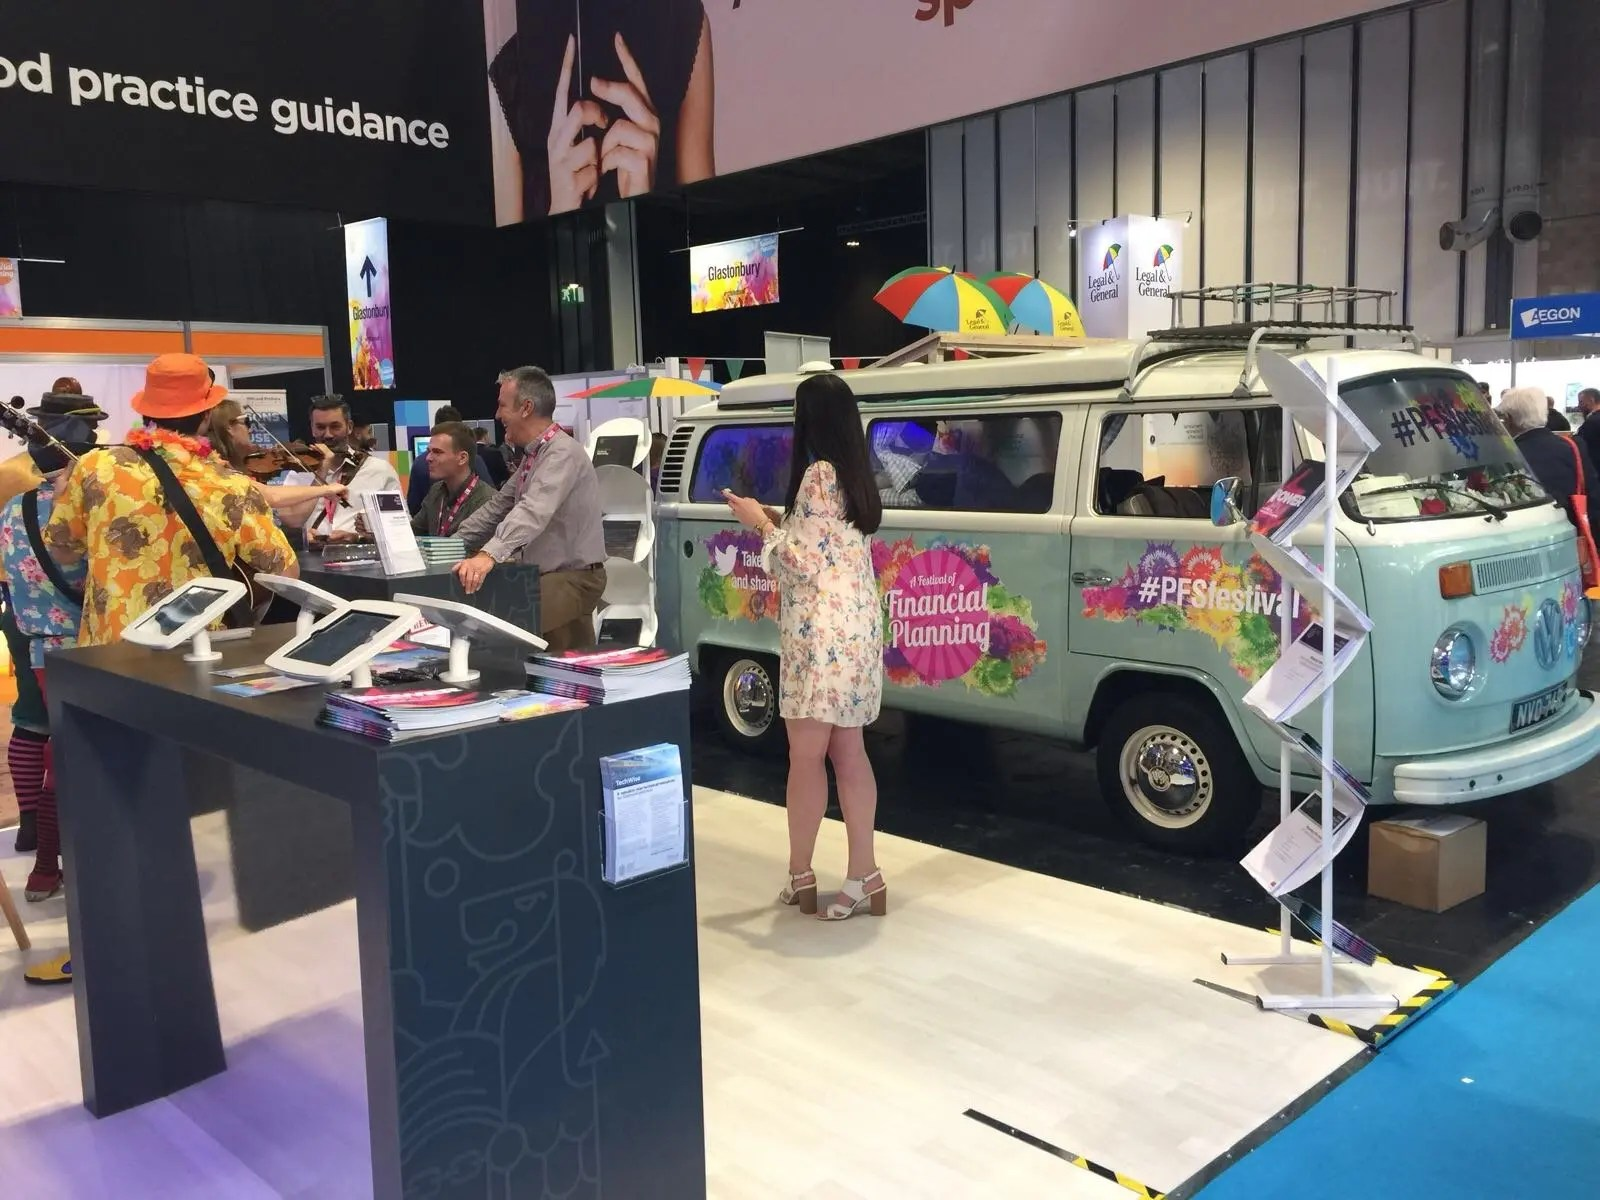 Branded campervan exhibition stand